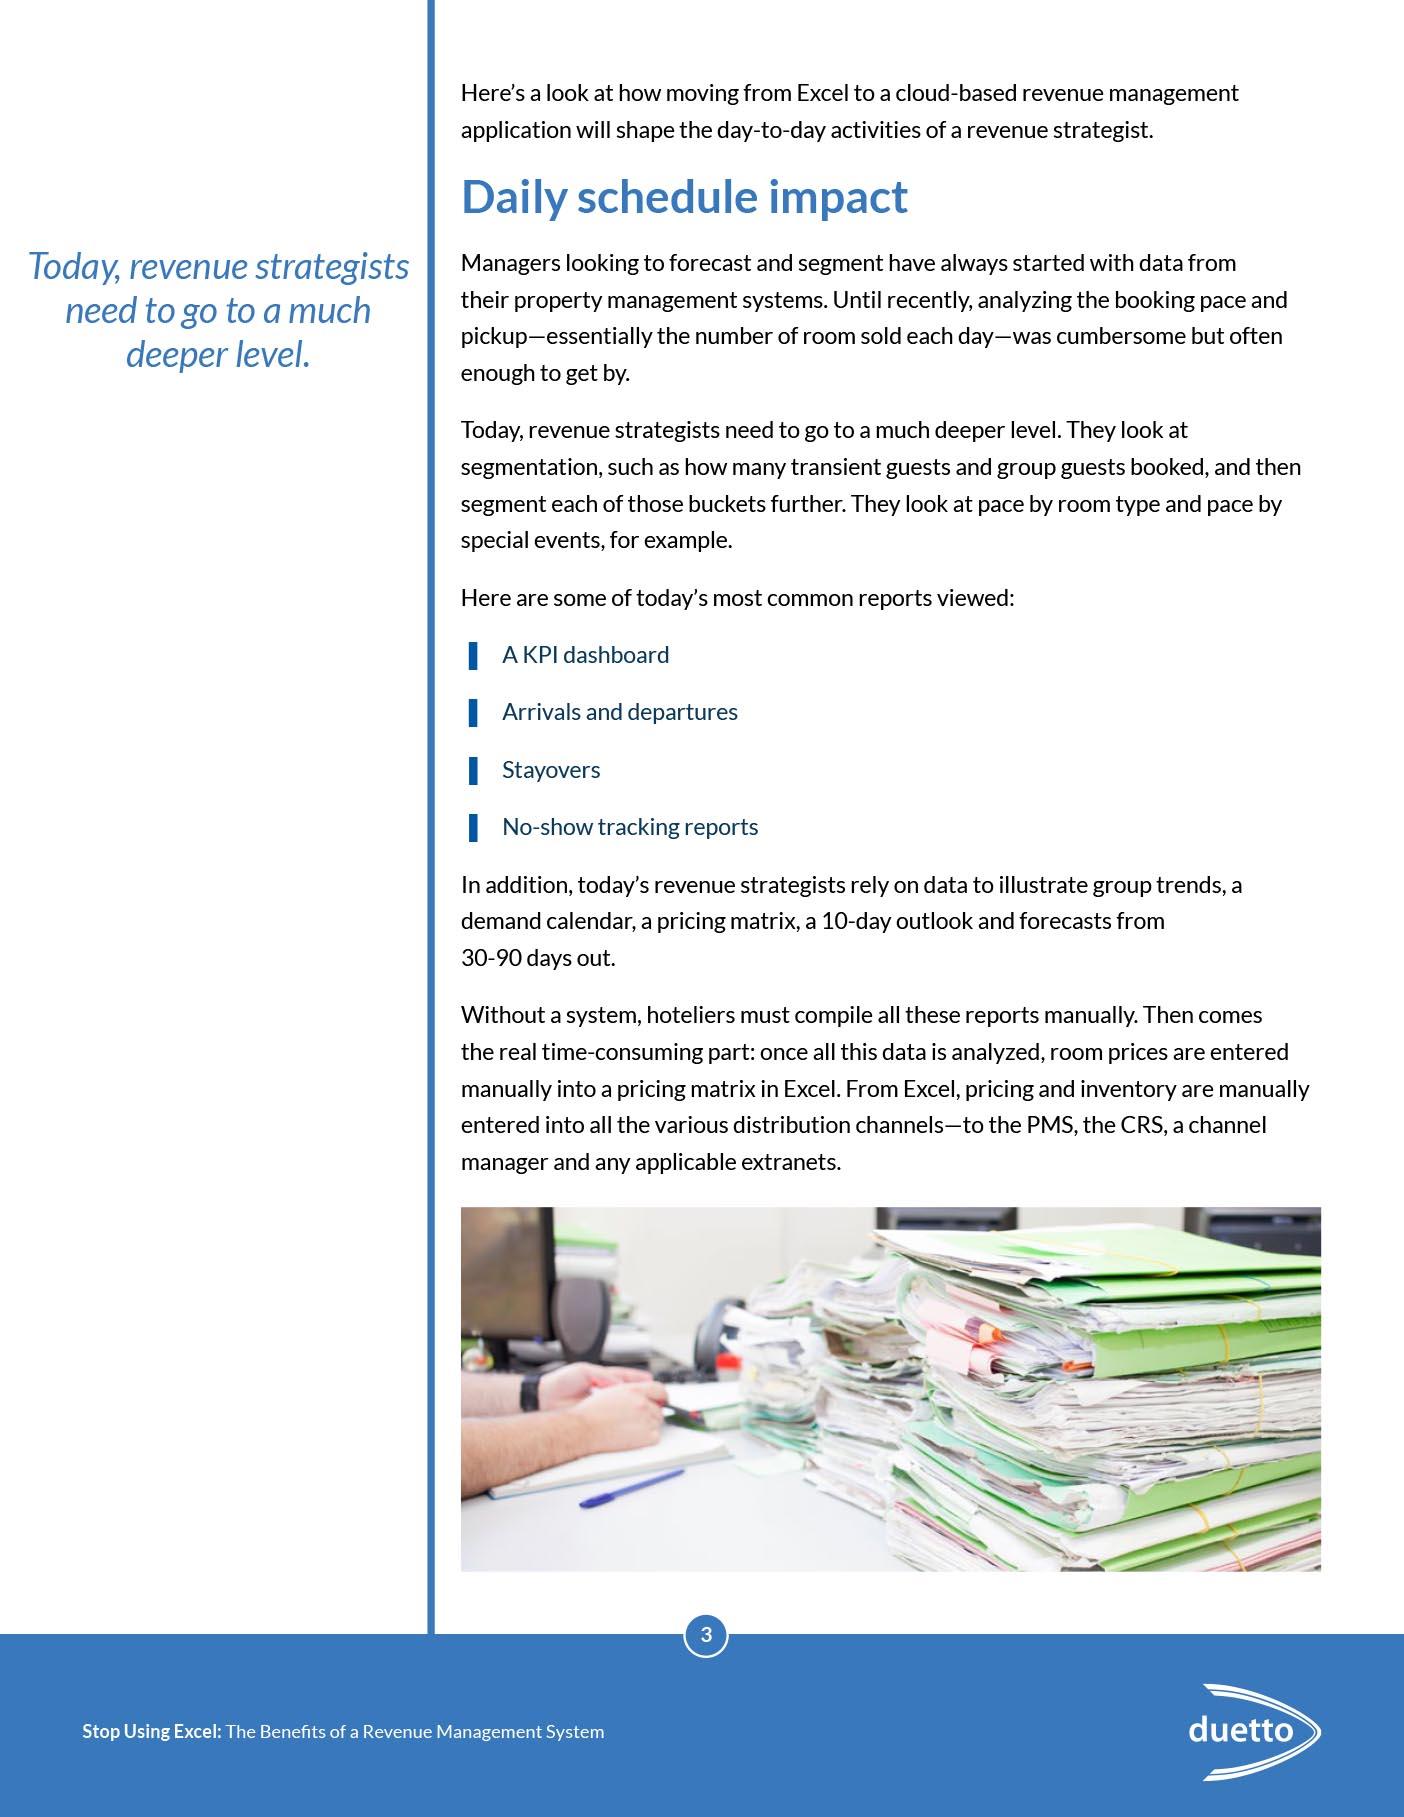 3 Stop-Using-Excel-Benefits-Revenue-Management-System-3.jpg